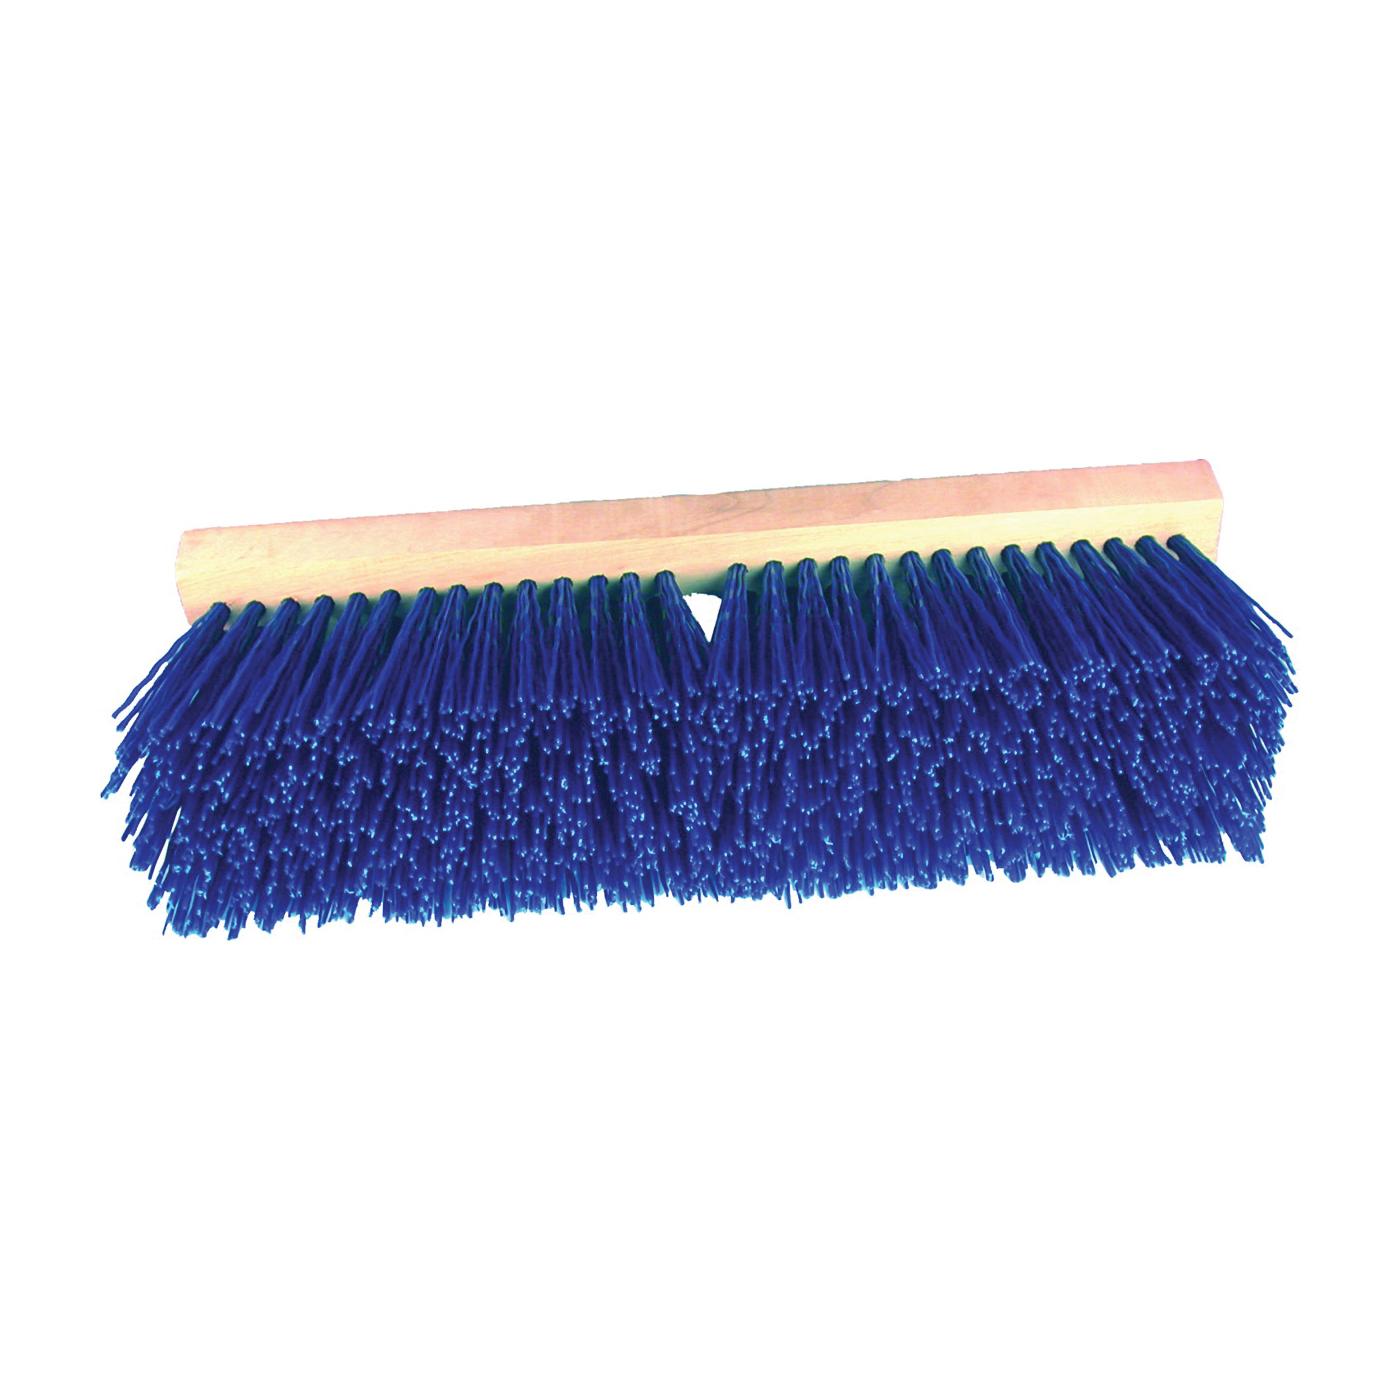 Picture of BIRDWELL 3015-6 Street Broom Head, 4-1/4 in L Trim, Polypropylene Bristle, Blue